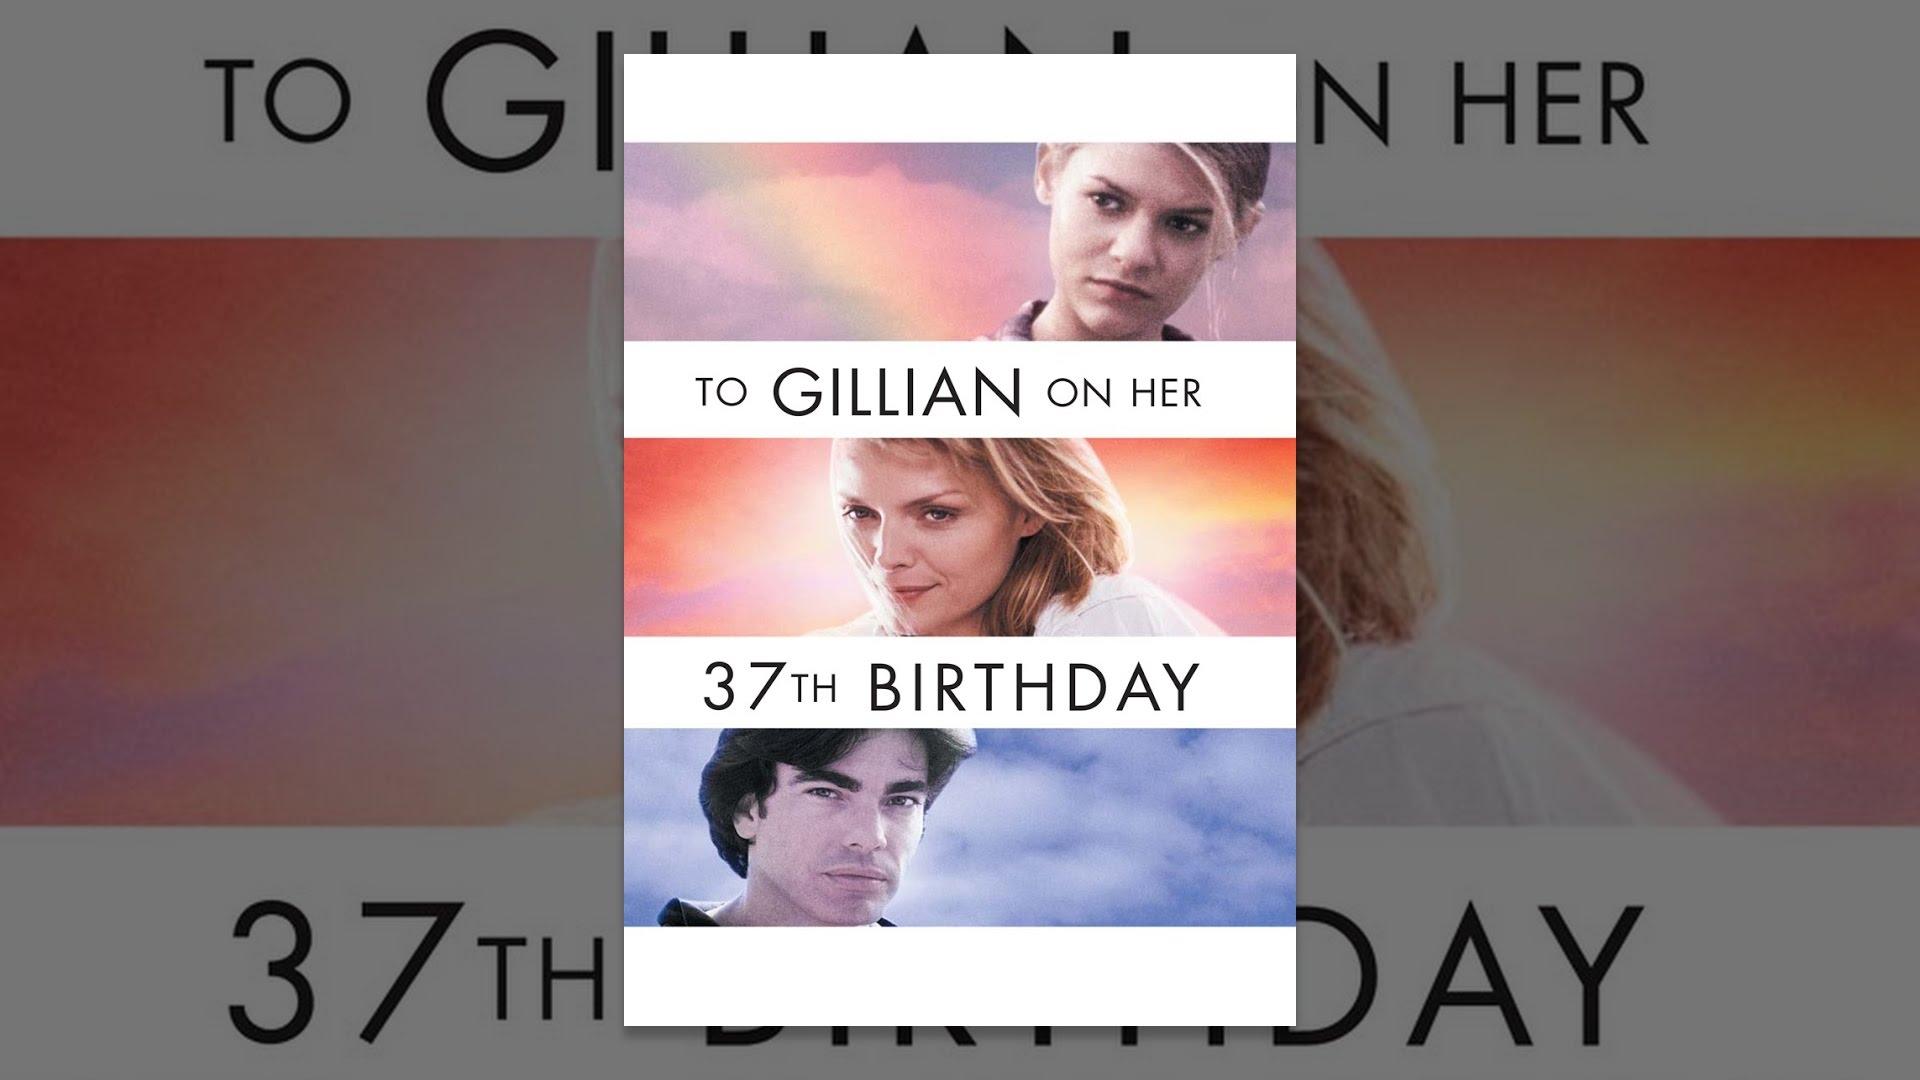 to gillian on her 37th birthday Free shipping buy to gillian on her 37th birthday movie poster (11 x 17) at walmartcom.